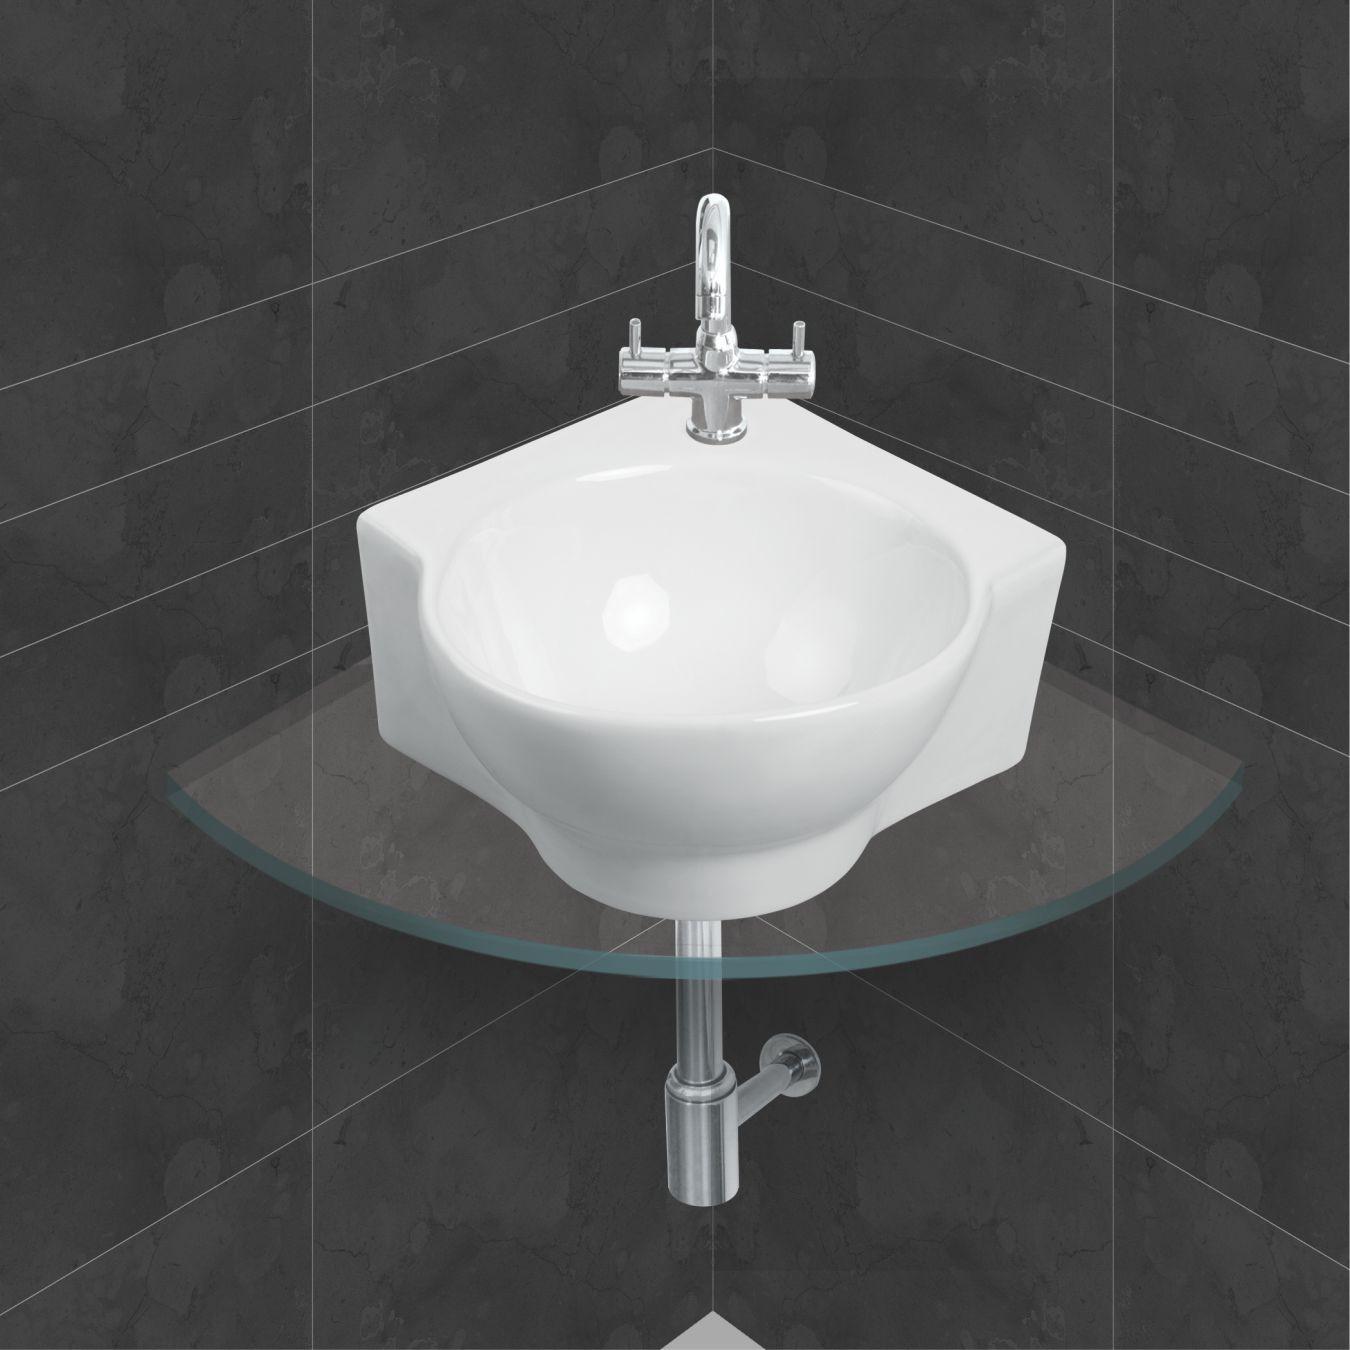 Buy Belmonte Bathroom Wall Hung Water Closet / EWC Mini ...